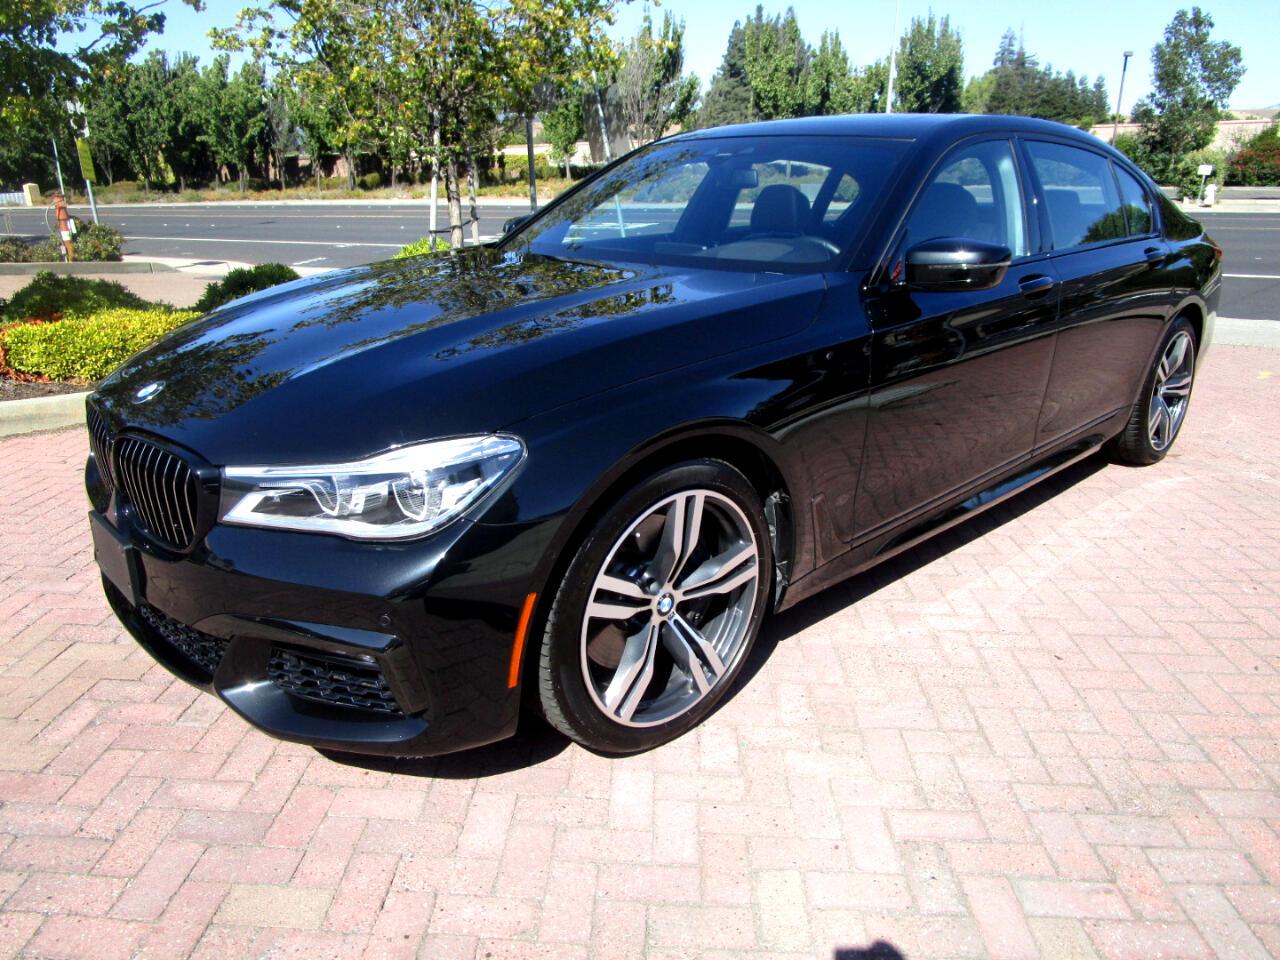 2016 BMW 750i M SPORT-EXEC*LUX HEAT/AC SEATS*DRIVER ASSIST PLUS*